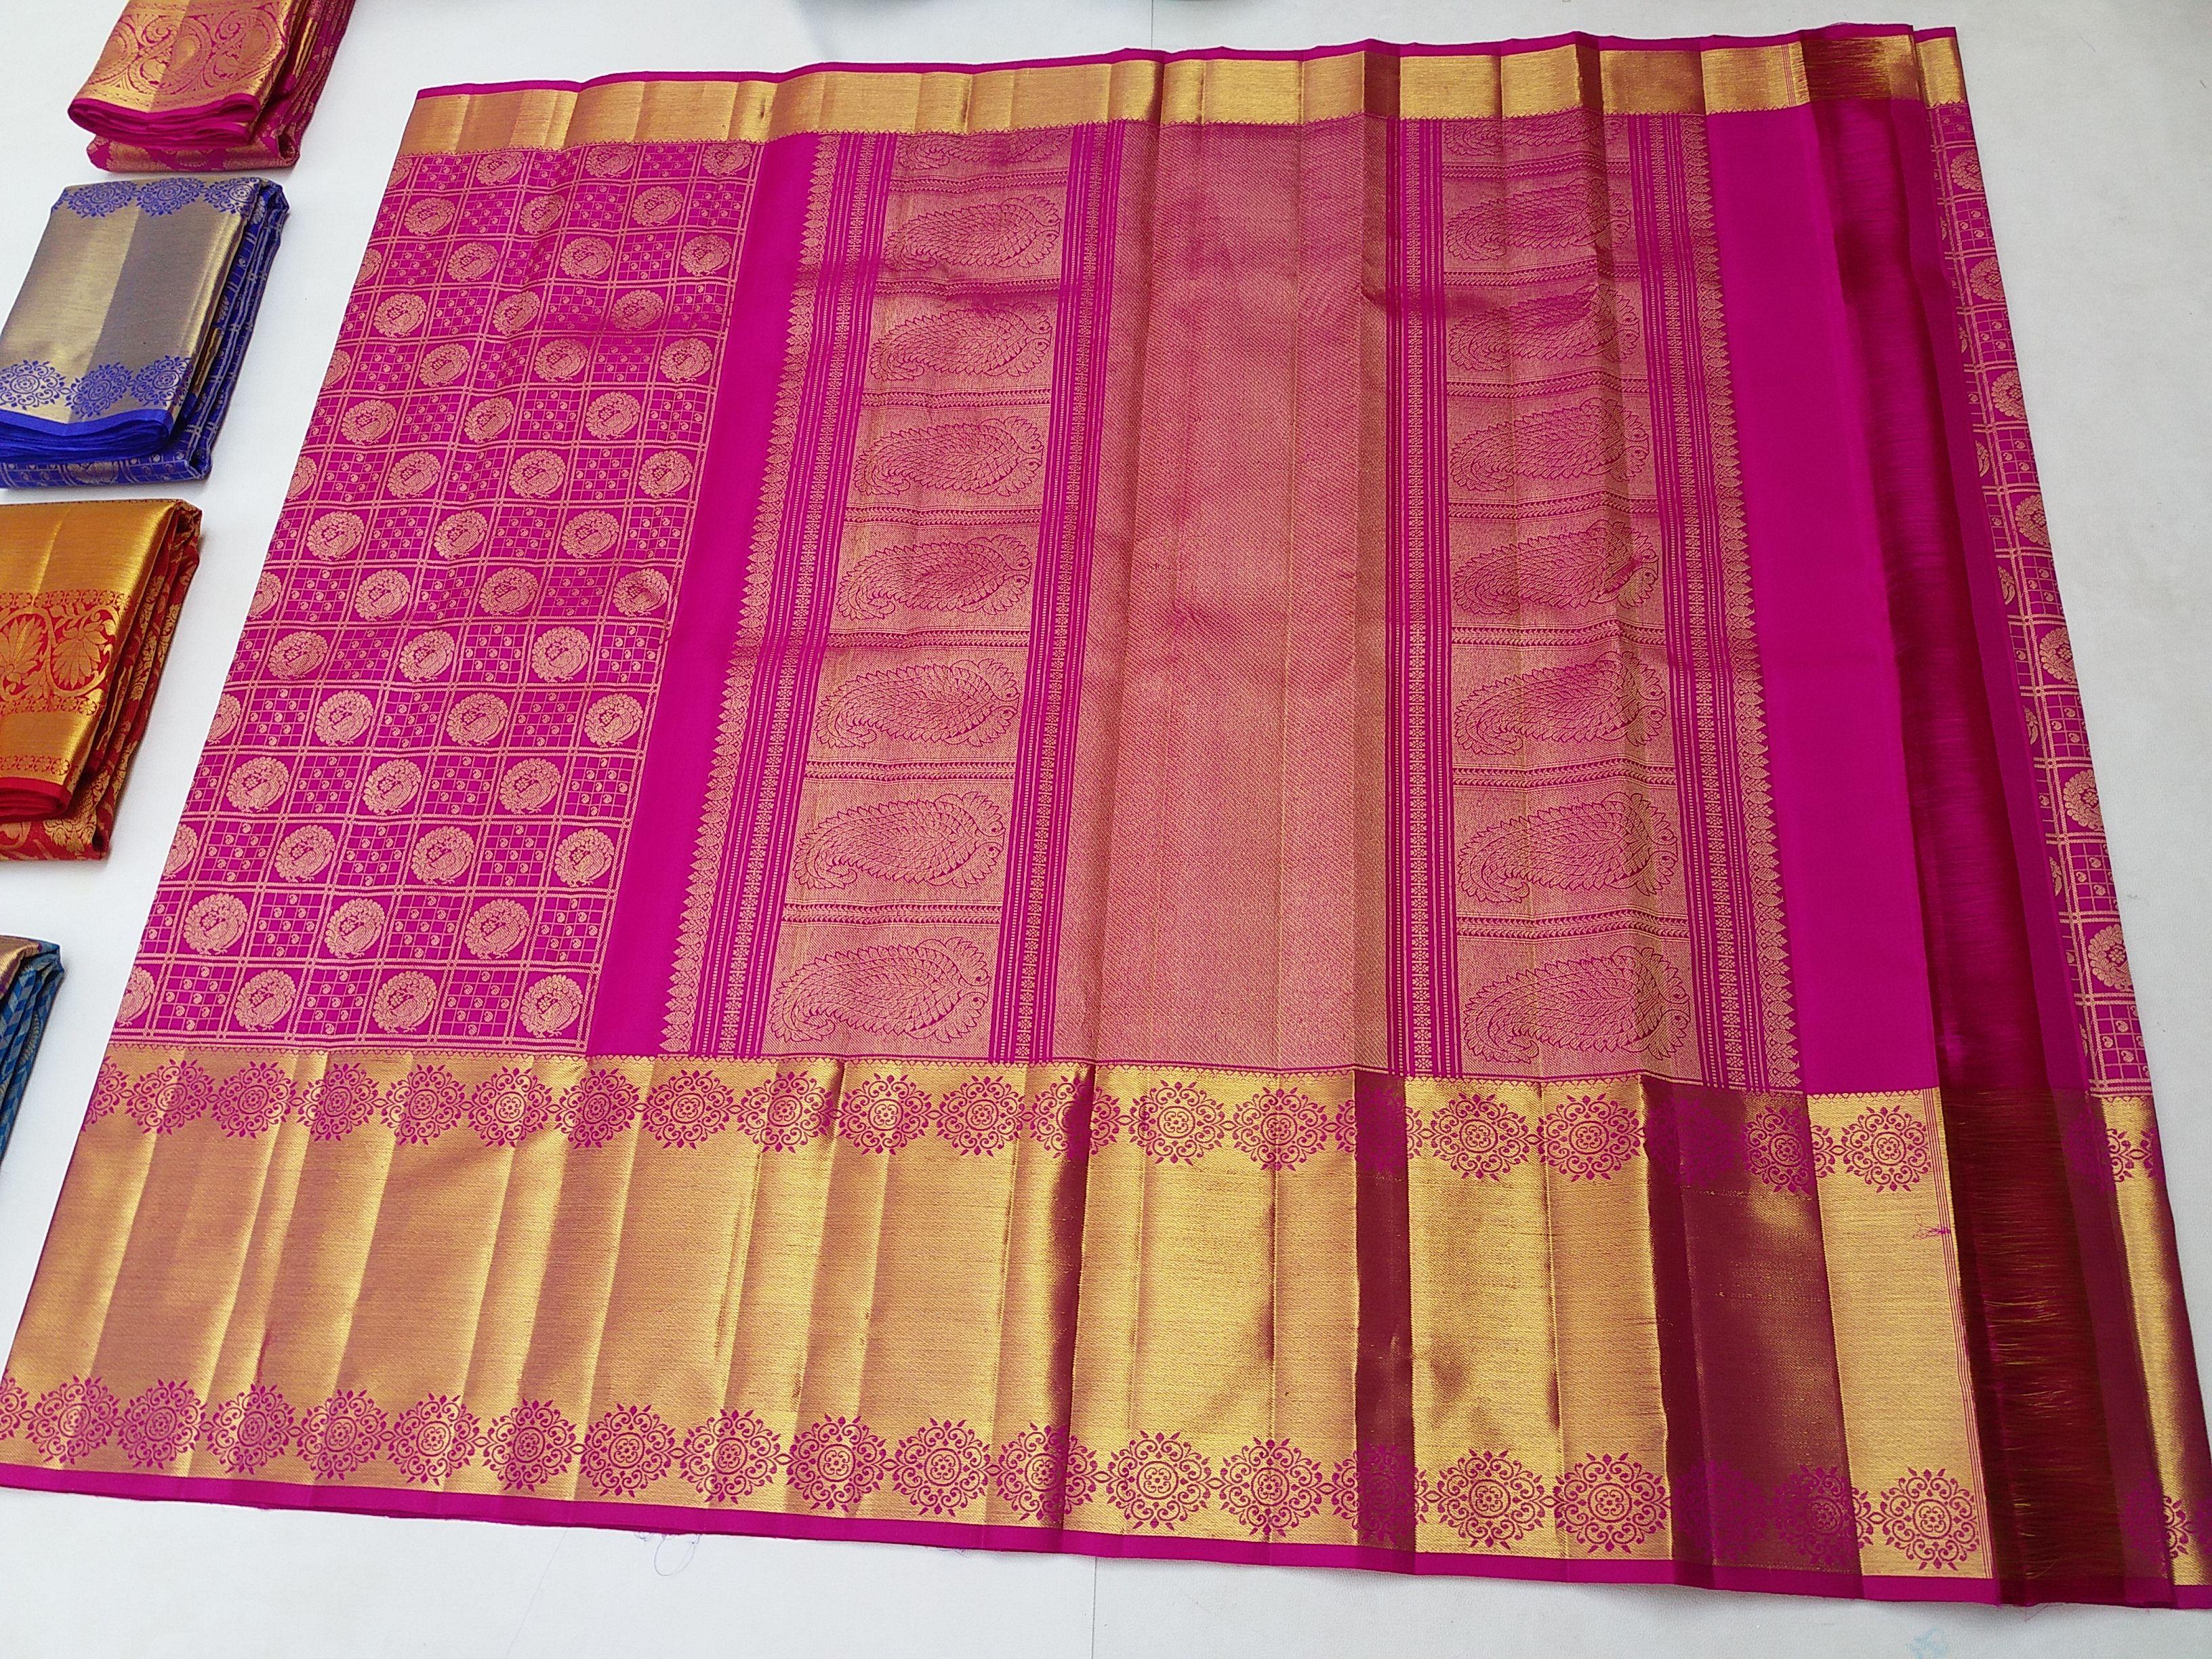 46b8770a88cf0 Sri Sarvalakshmi Silks Saree Manufacture   Wholesale Supplier Leading  Manufacturer and Wholesale supplier of Kanchipuram Silk Sarees   SarvalakshmiSilks ...